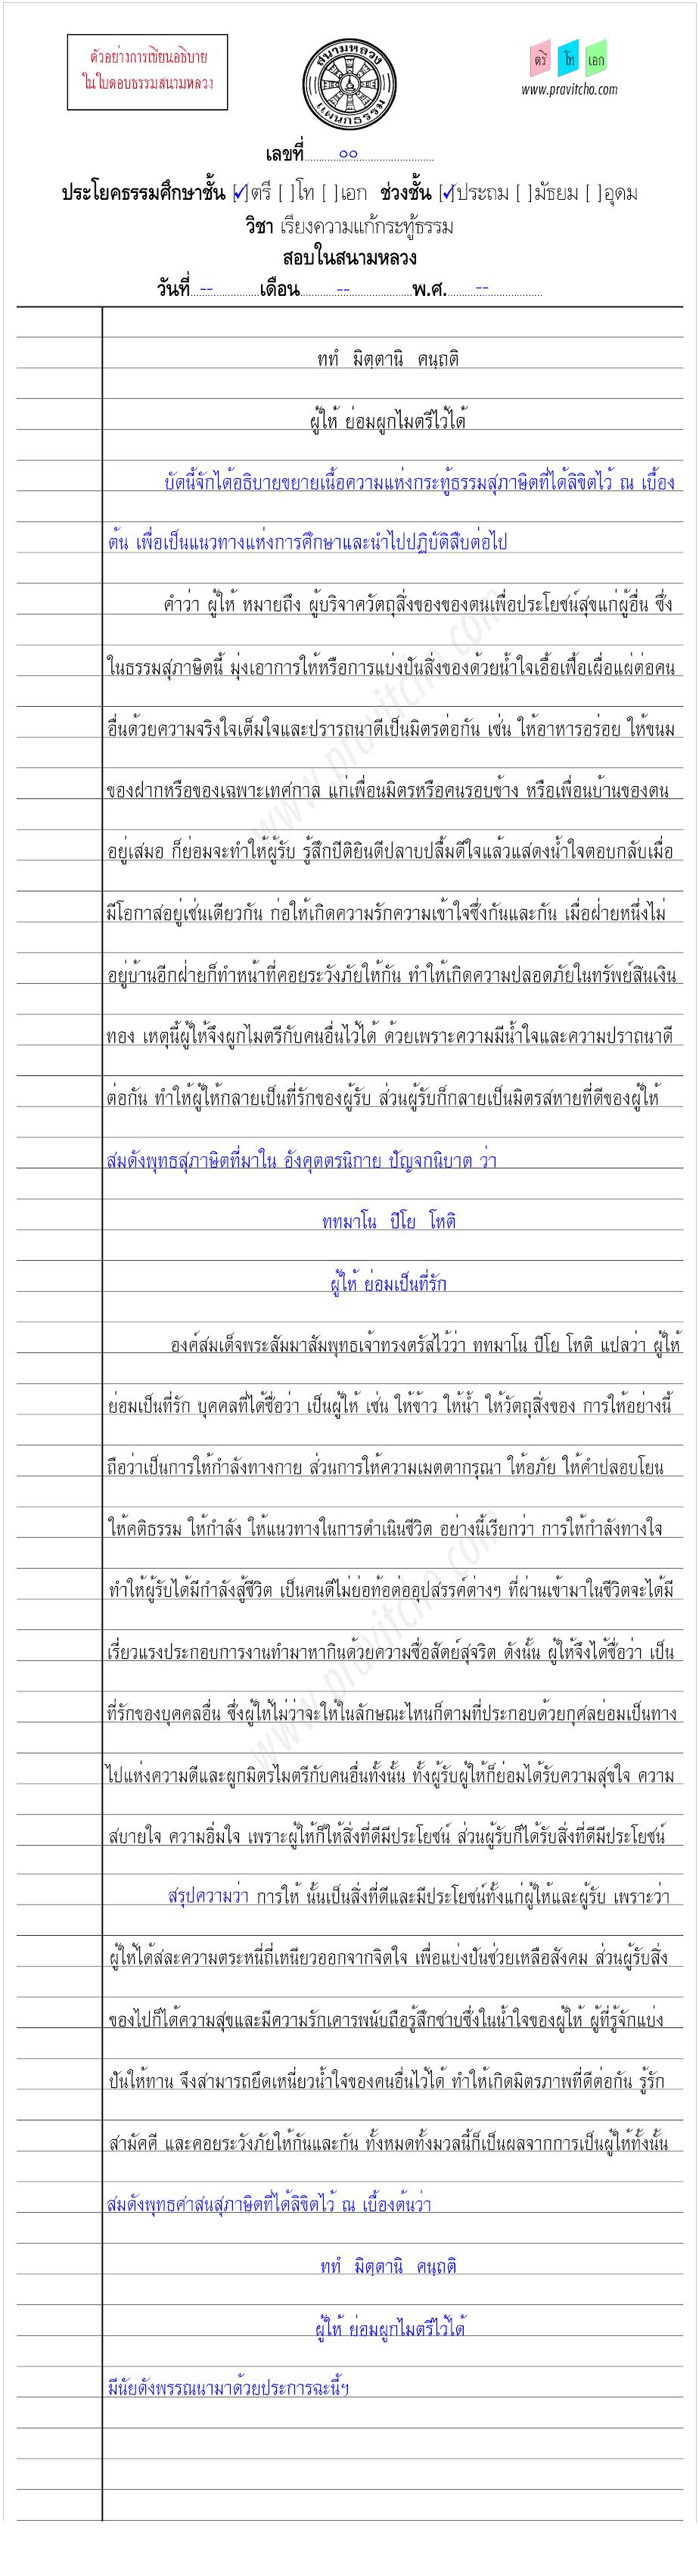 <h1>ตัวอย่างการเขียนเรียงความแก้กระทู้ธรรมชั้นตรี</h1>